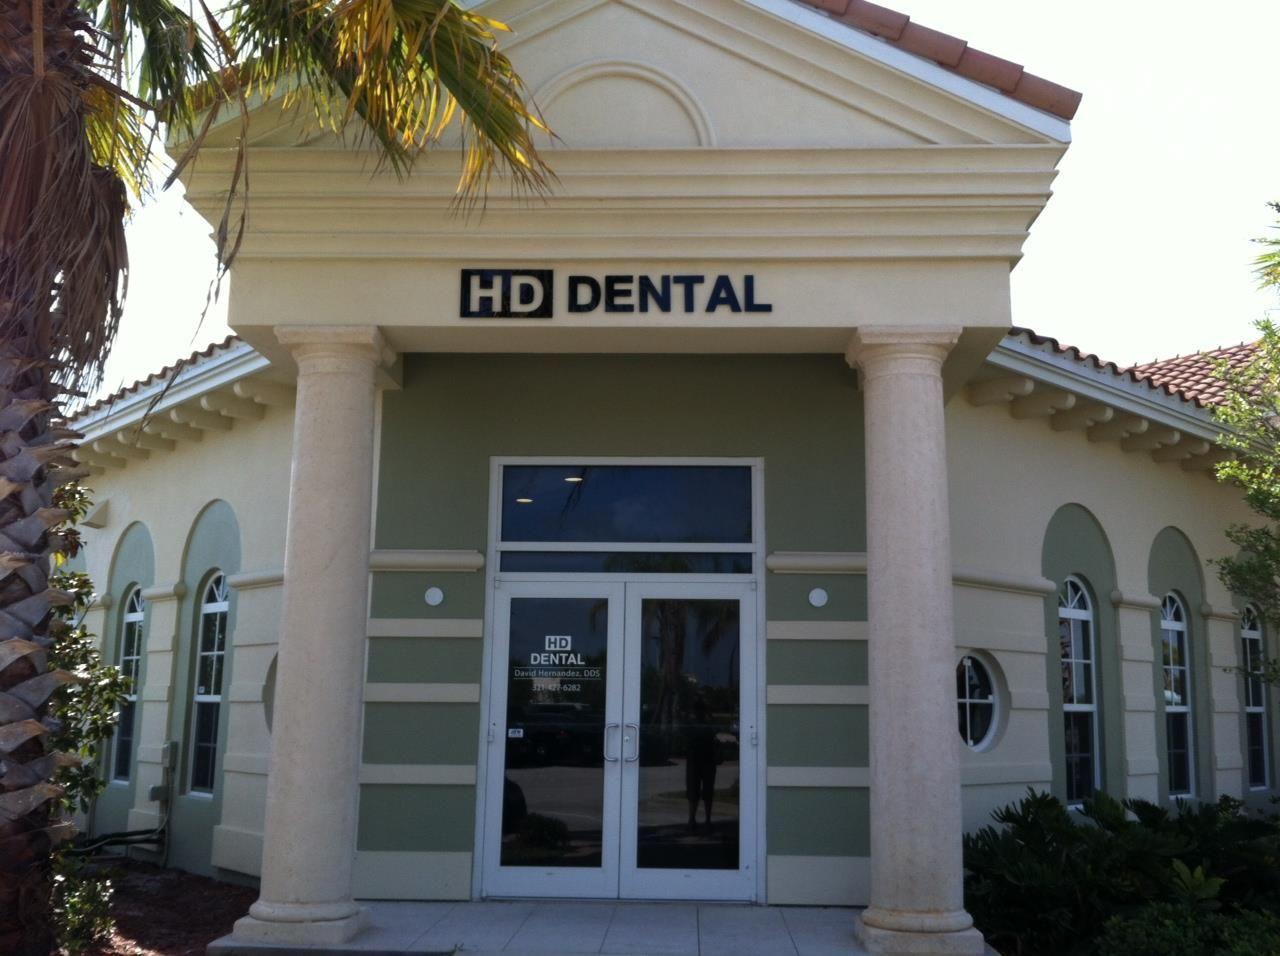 Hd Dental 1715 Berglund Lane Unit 1 Viera Florida 32940 321 427 6282 Dental Dentist Near Me Viera Florida